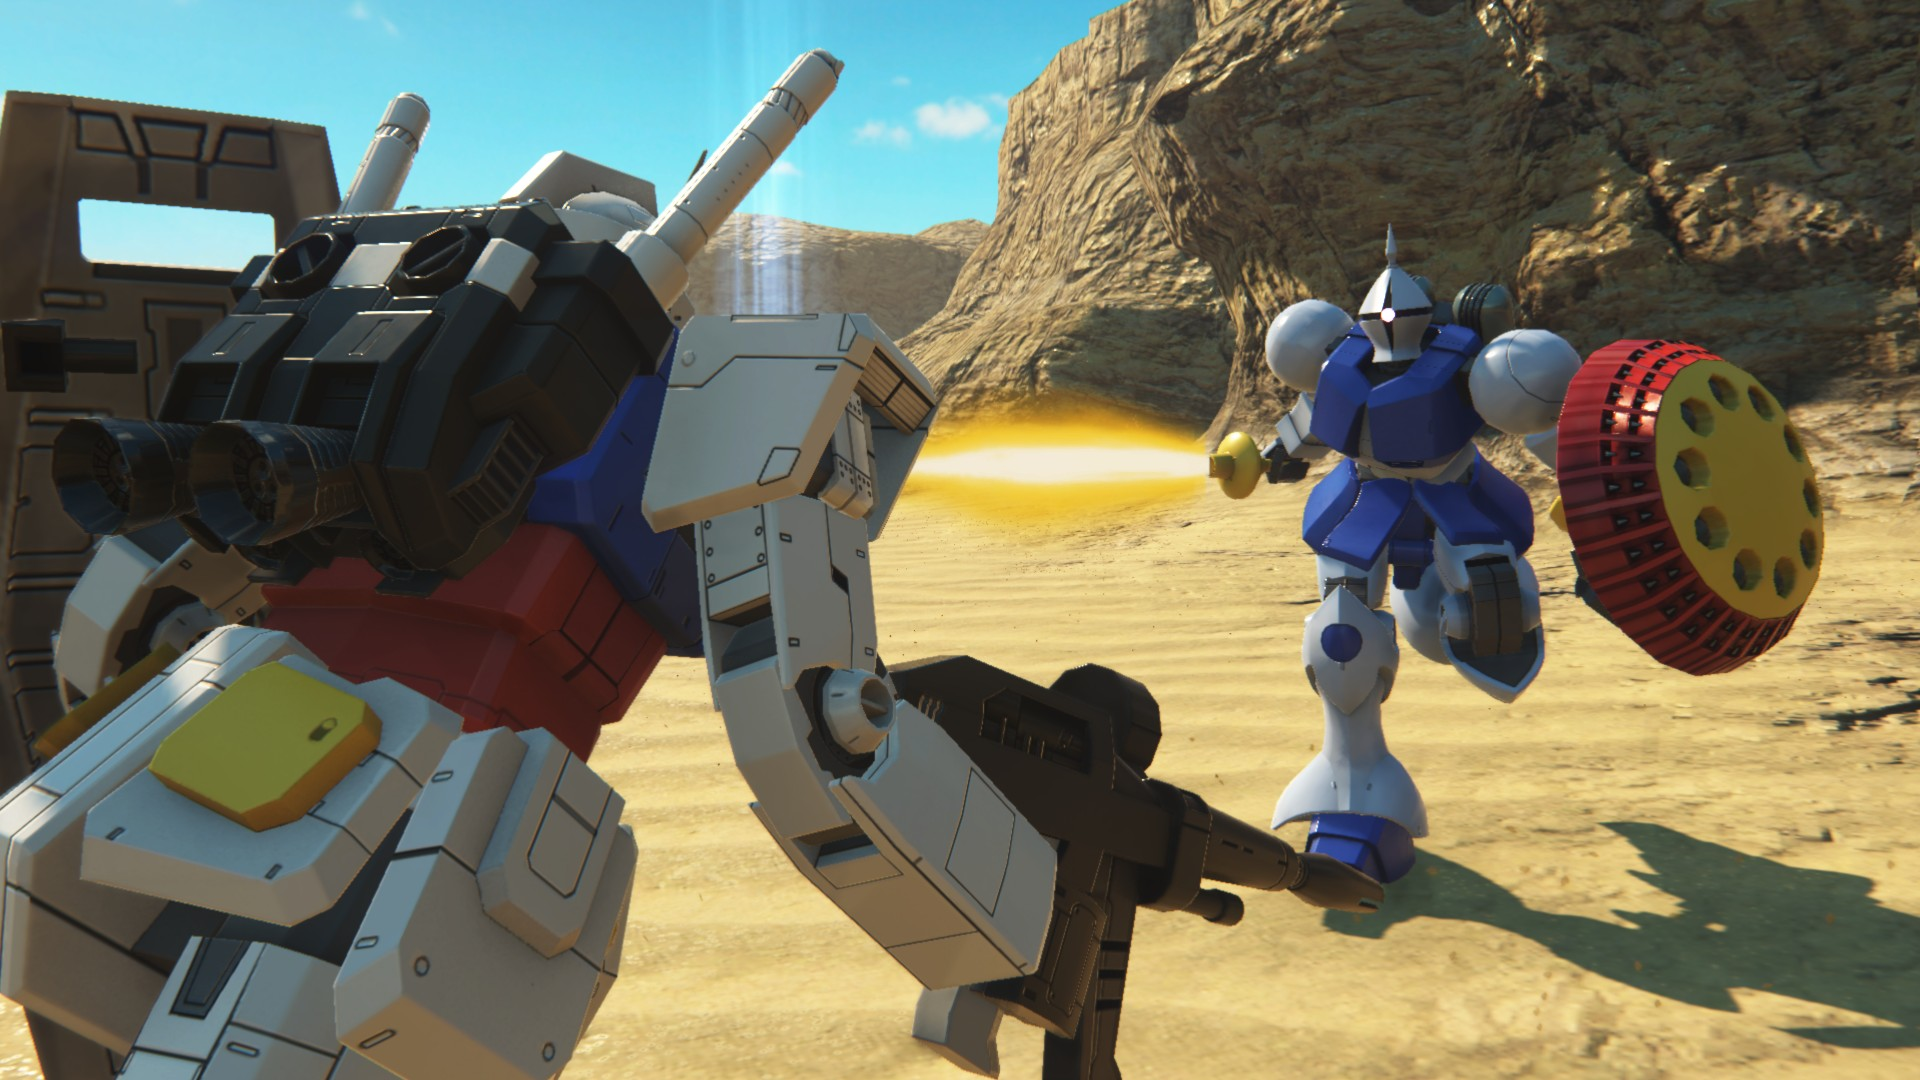 《Gundam Breaker 3》小白爆機教學 必裝裝備附屬功能編